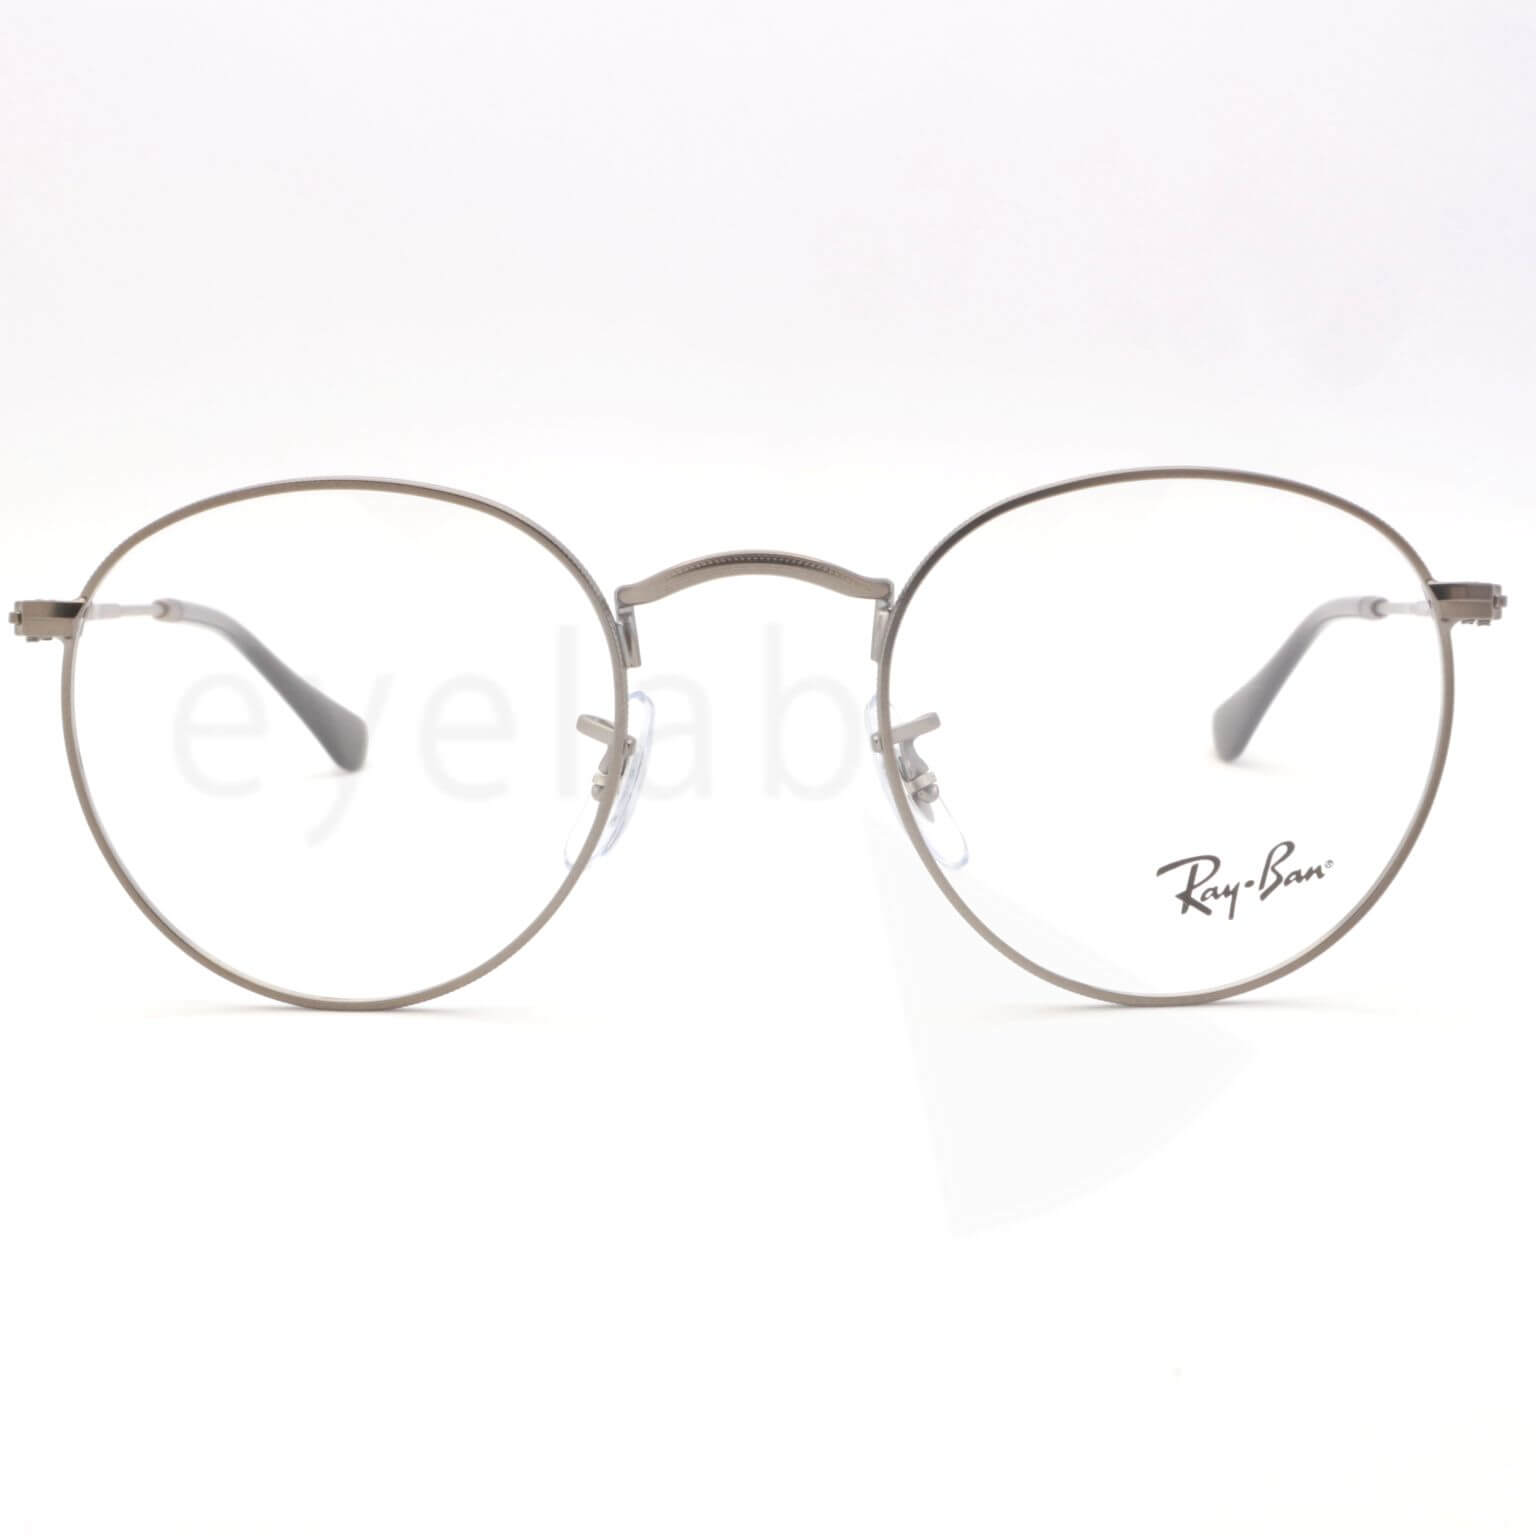 af41f640b5 Γυαλιά οράσεως Ray-Ban Round Metal 3447V 2620